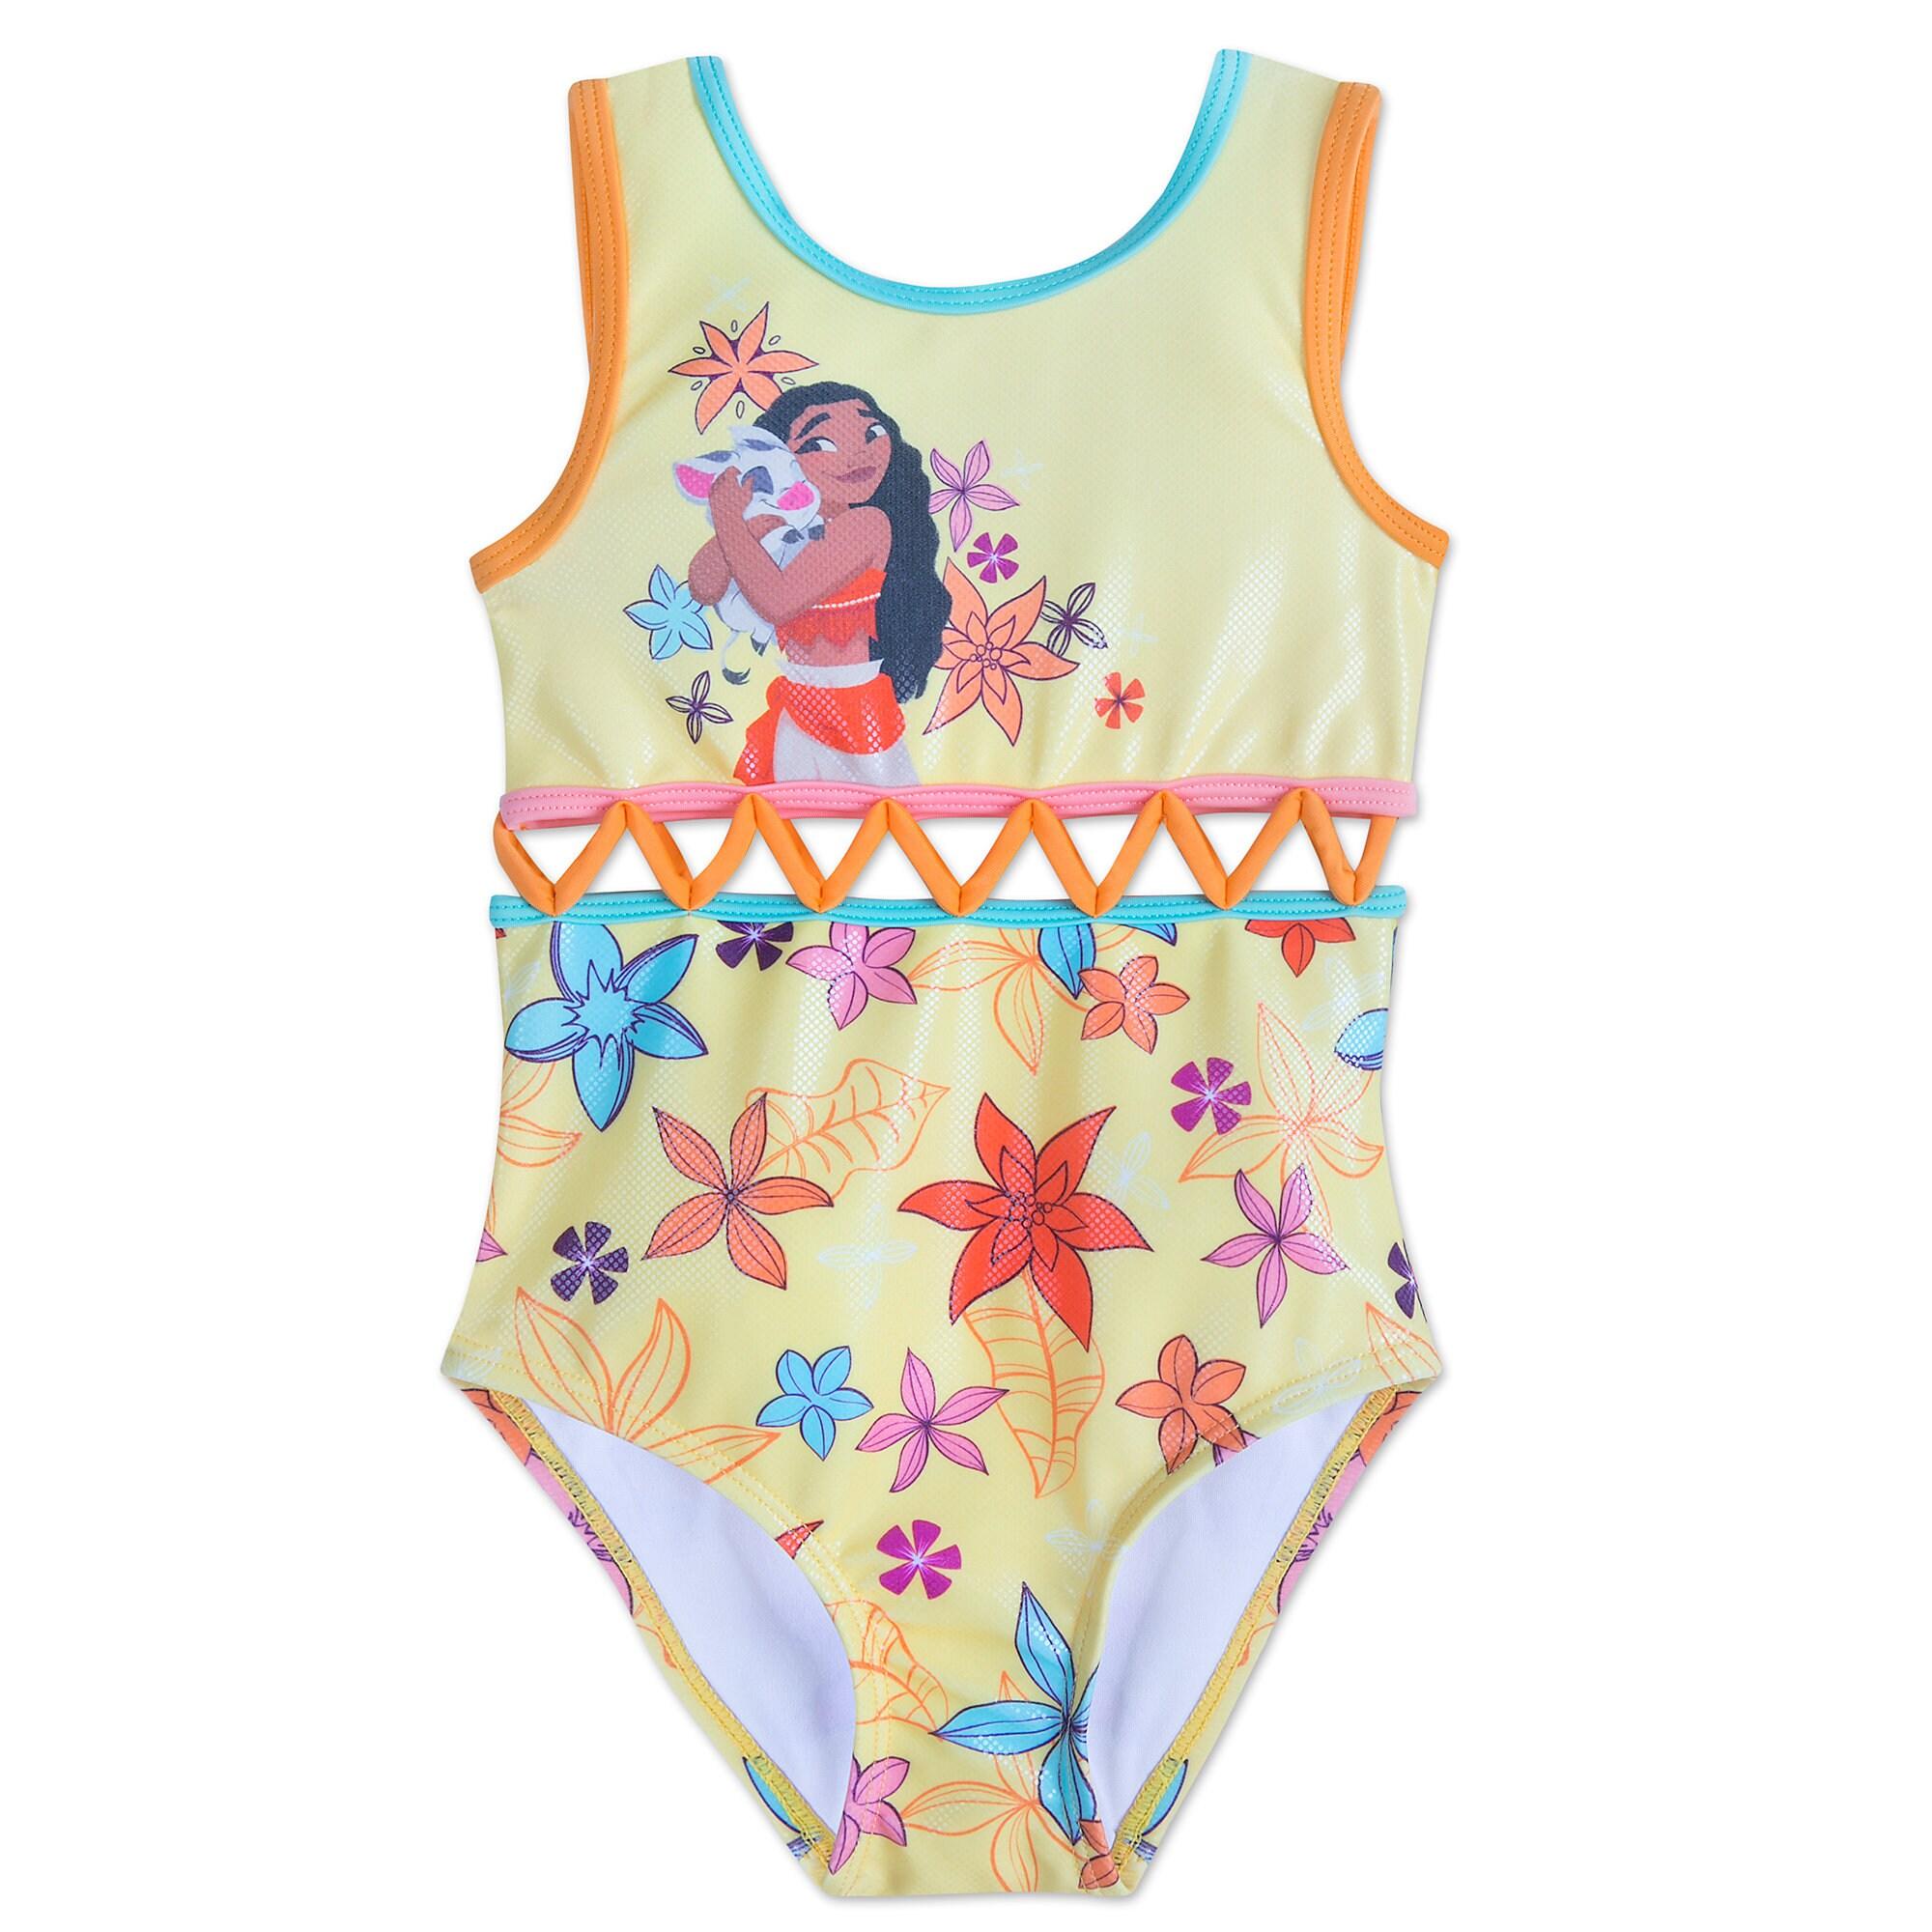 Lovely Product Image Of Moana Swimsuit For Girls # 1